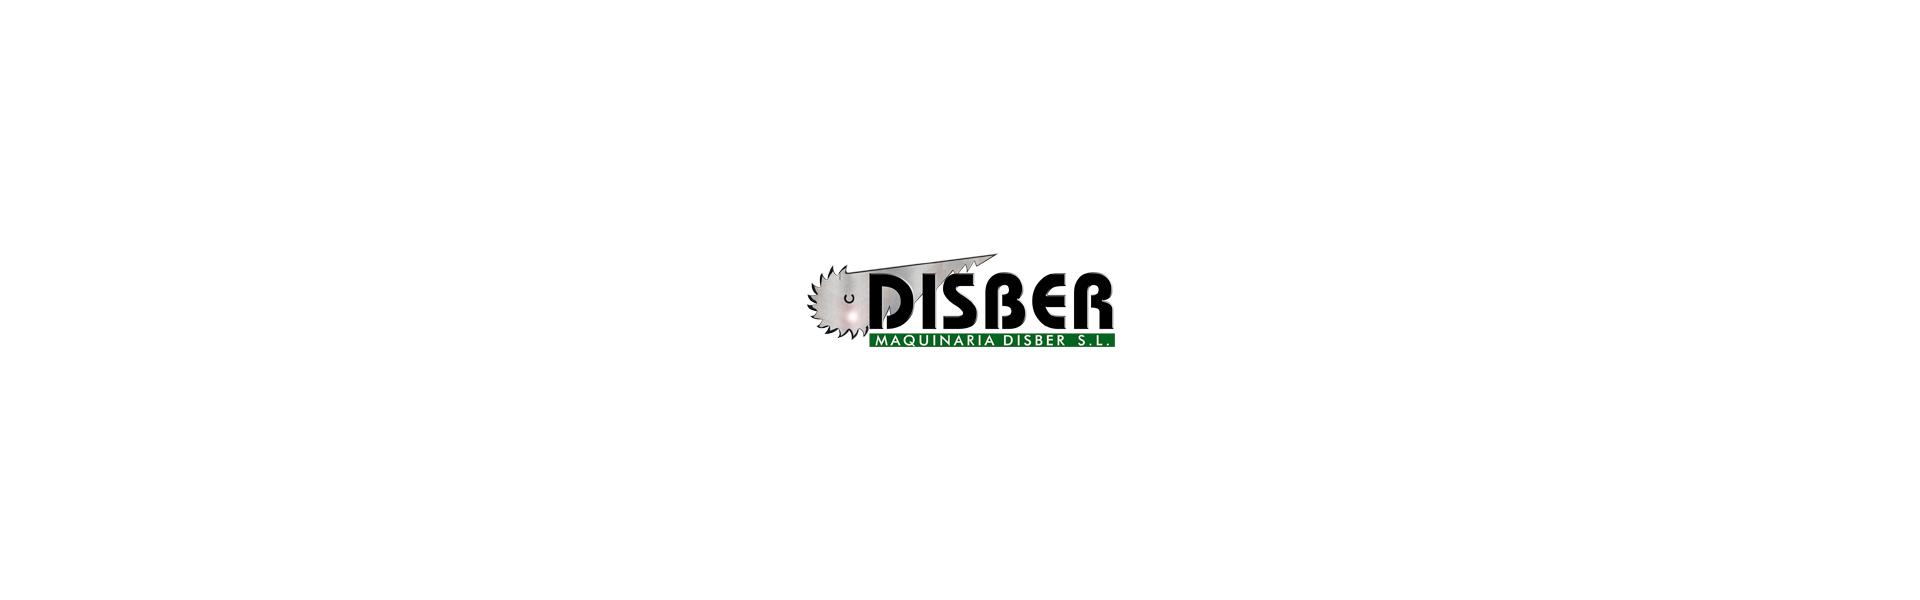 disber